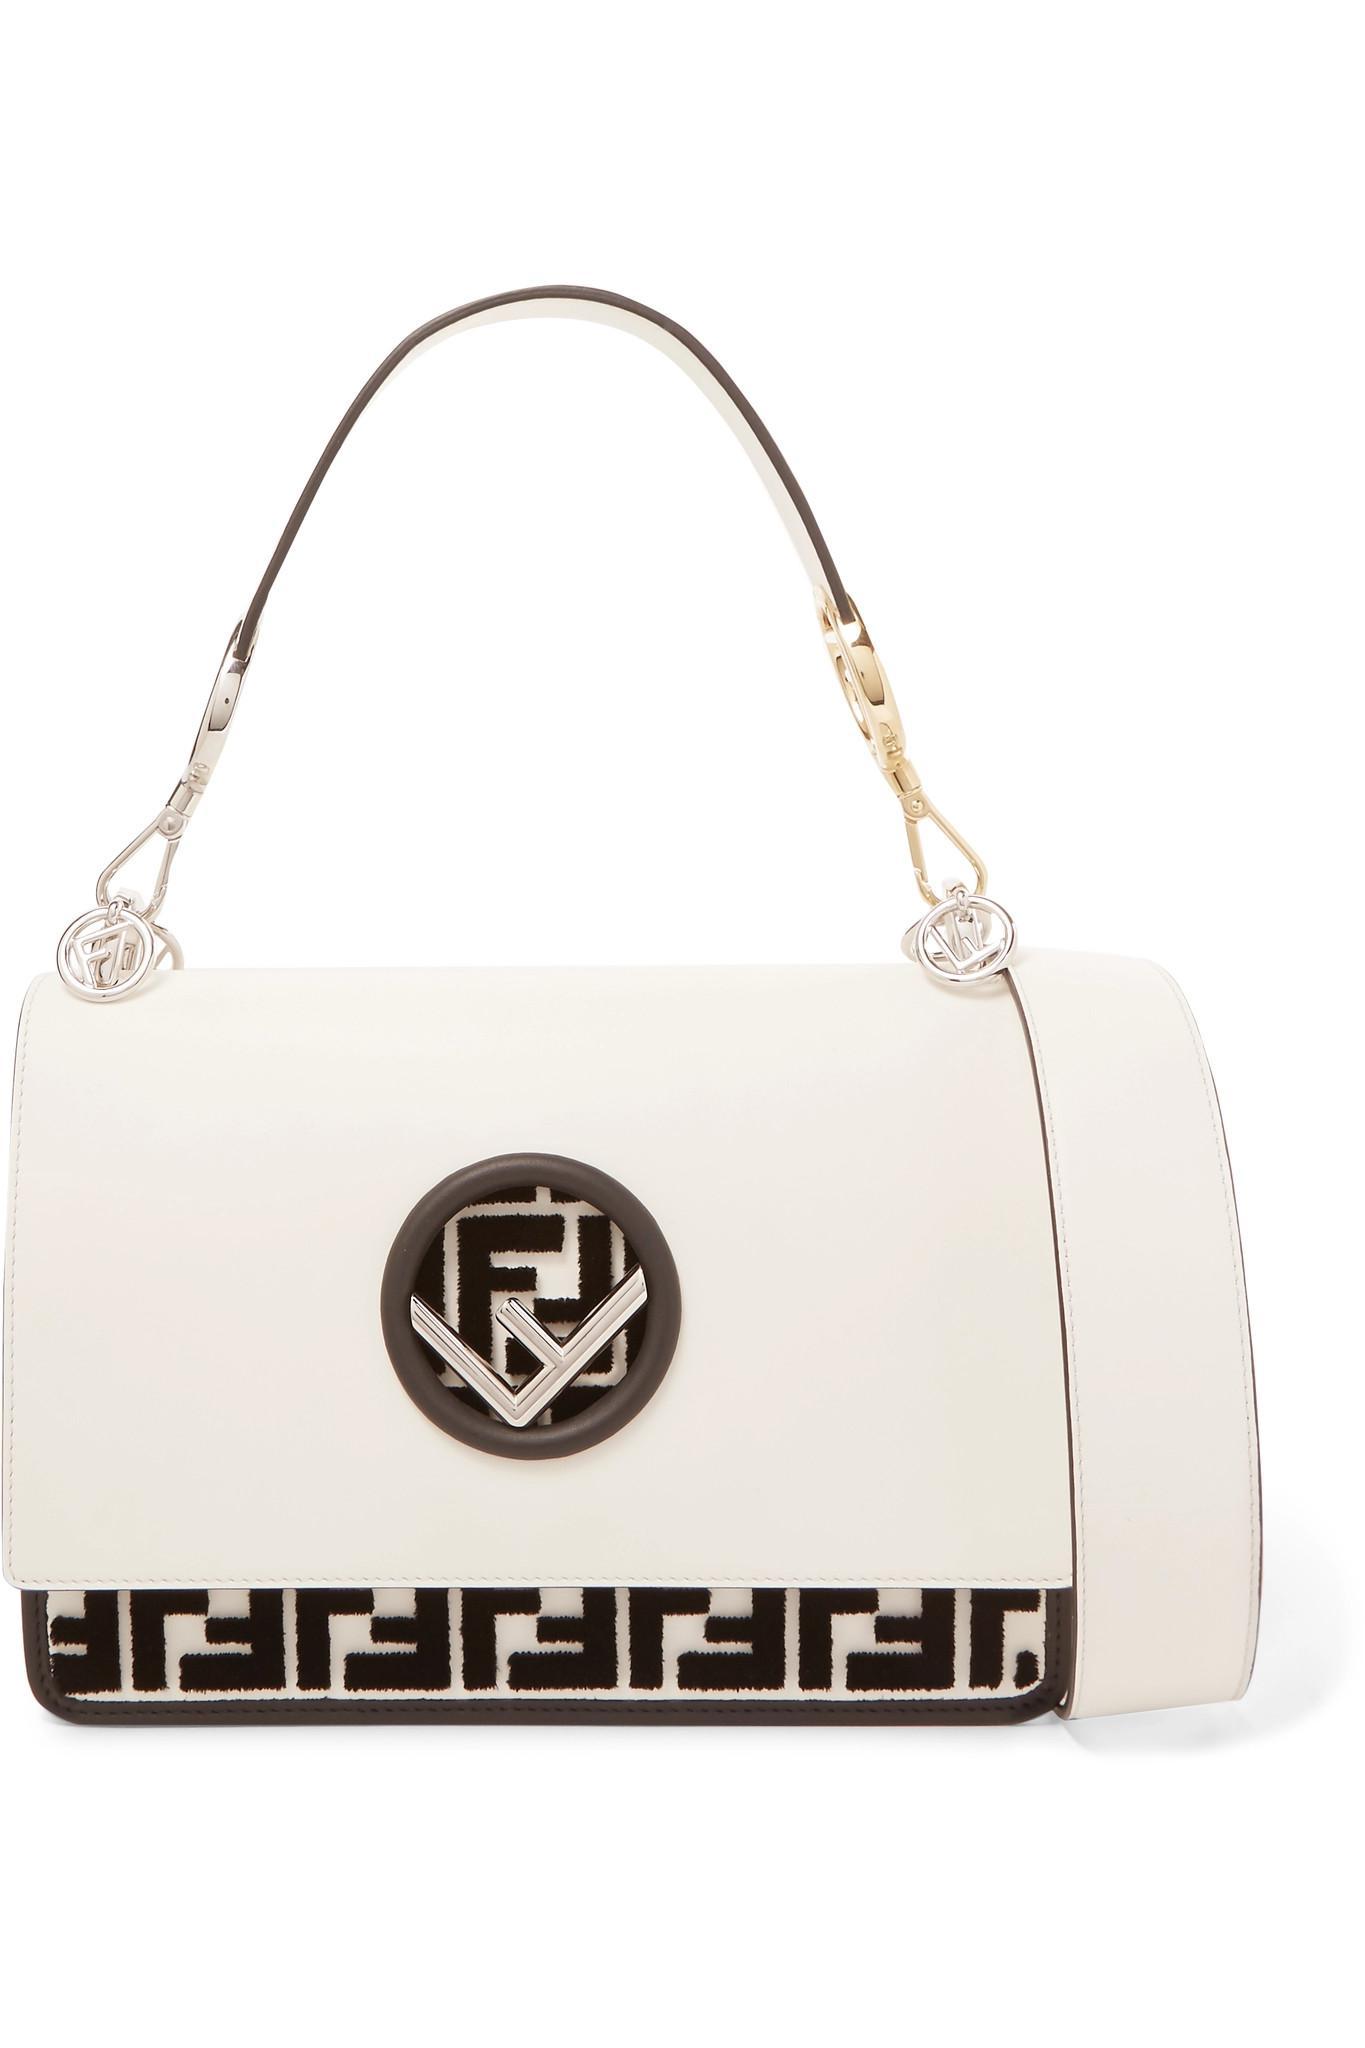 Fendi Kan I Flocked Leather Shoulder Bag in White - Lyst 93d09860e4021